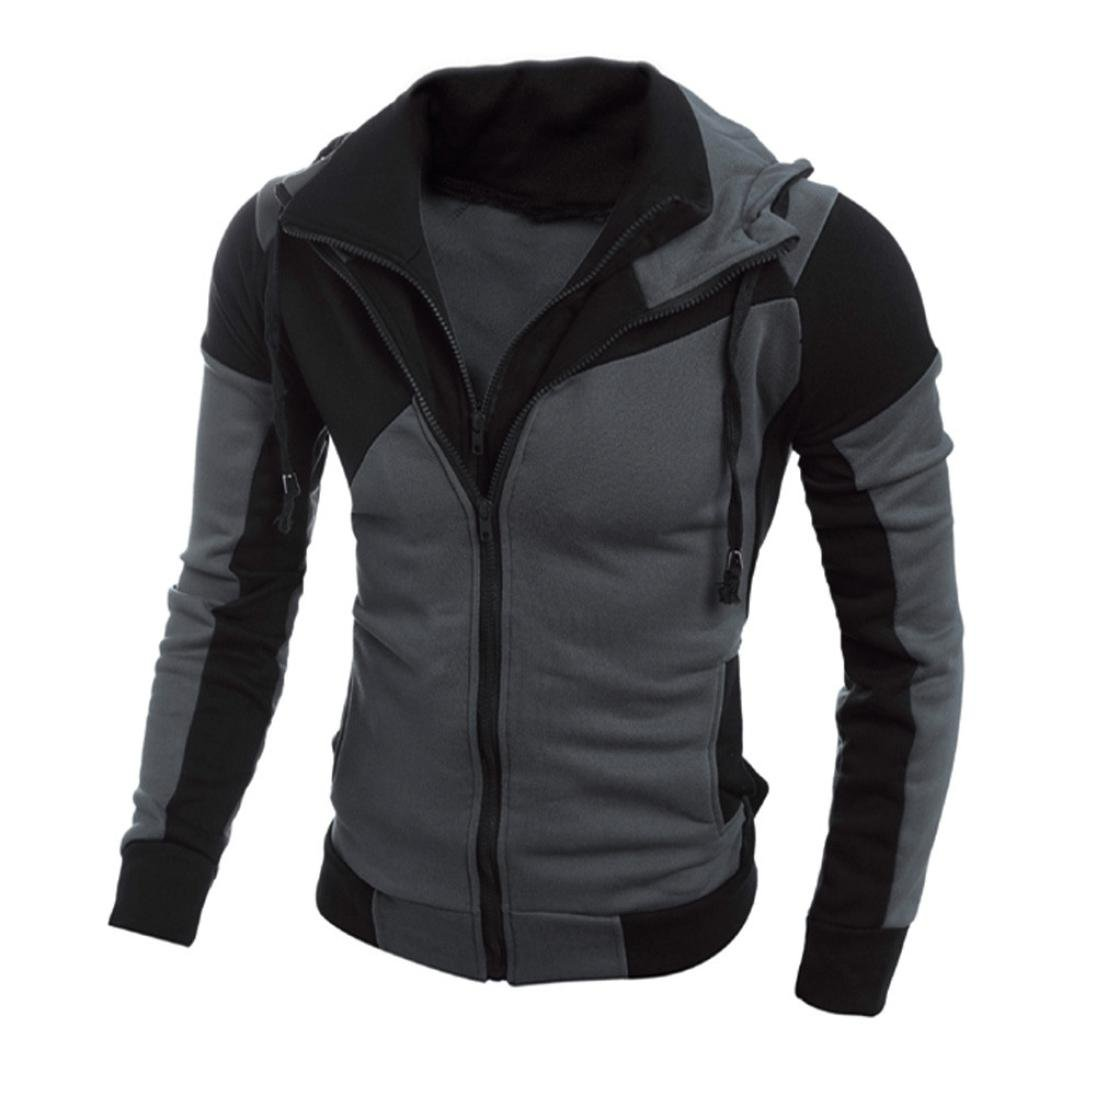 Men Zip Hoodies Kangaroo Pocket Sweatshirt Layered Jackets (Black, XXL) by HTHJSCO